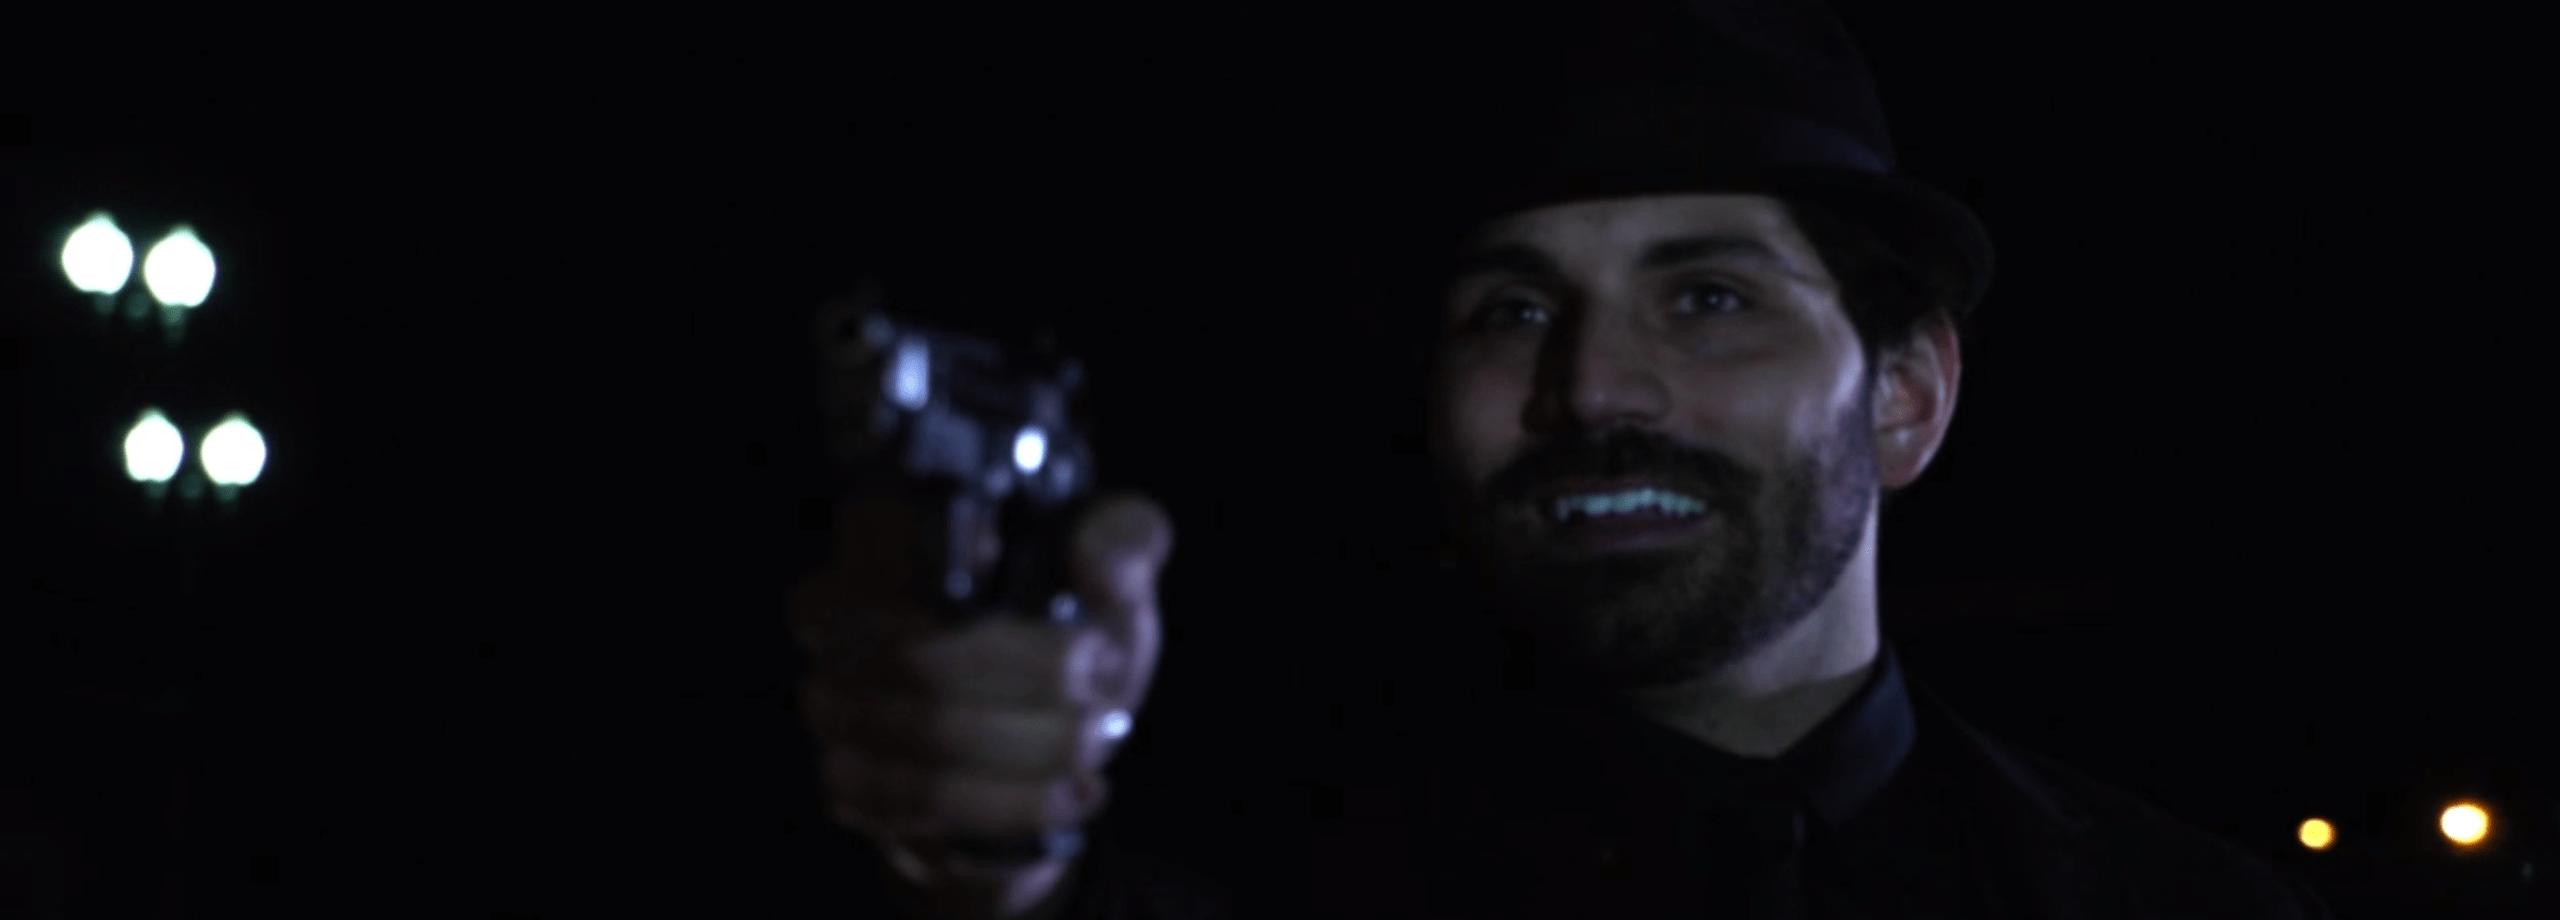 A fedora-wearing man pointing a gun